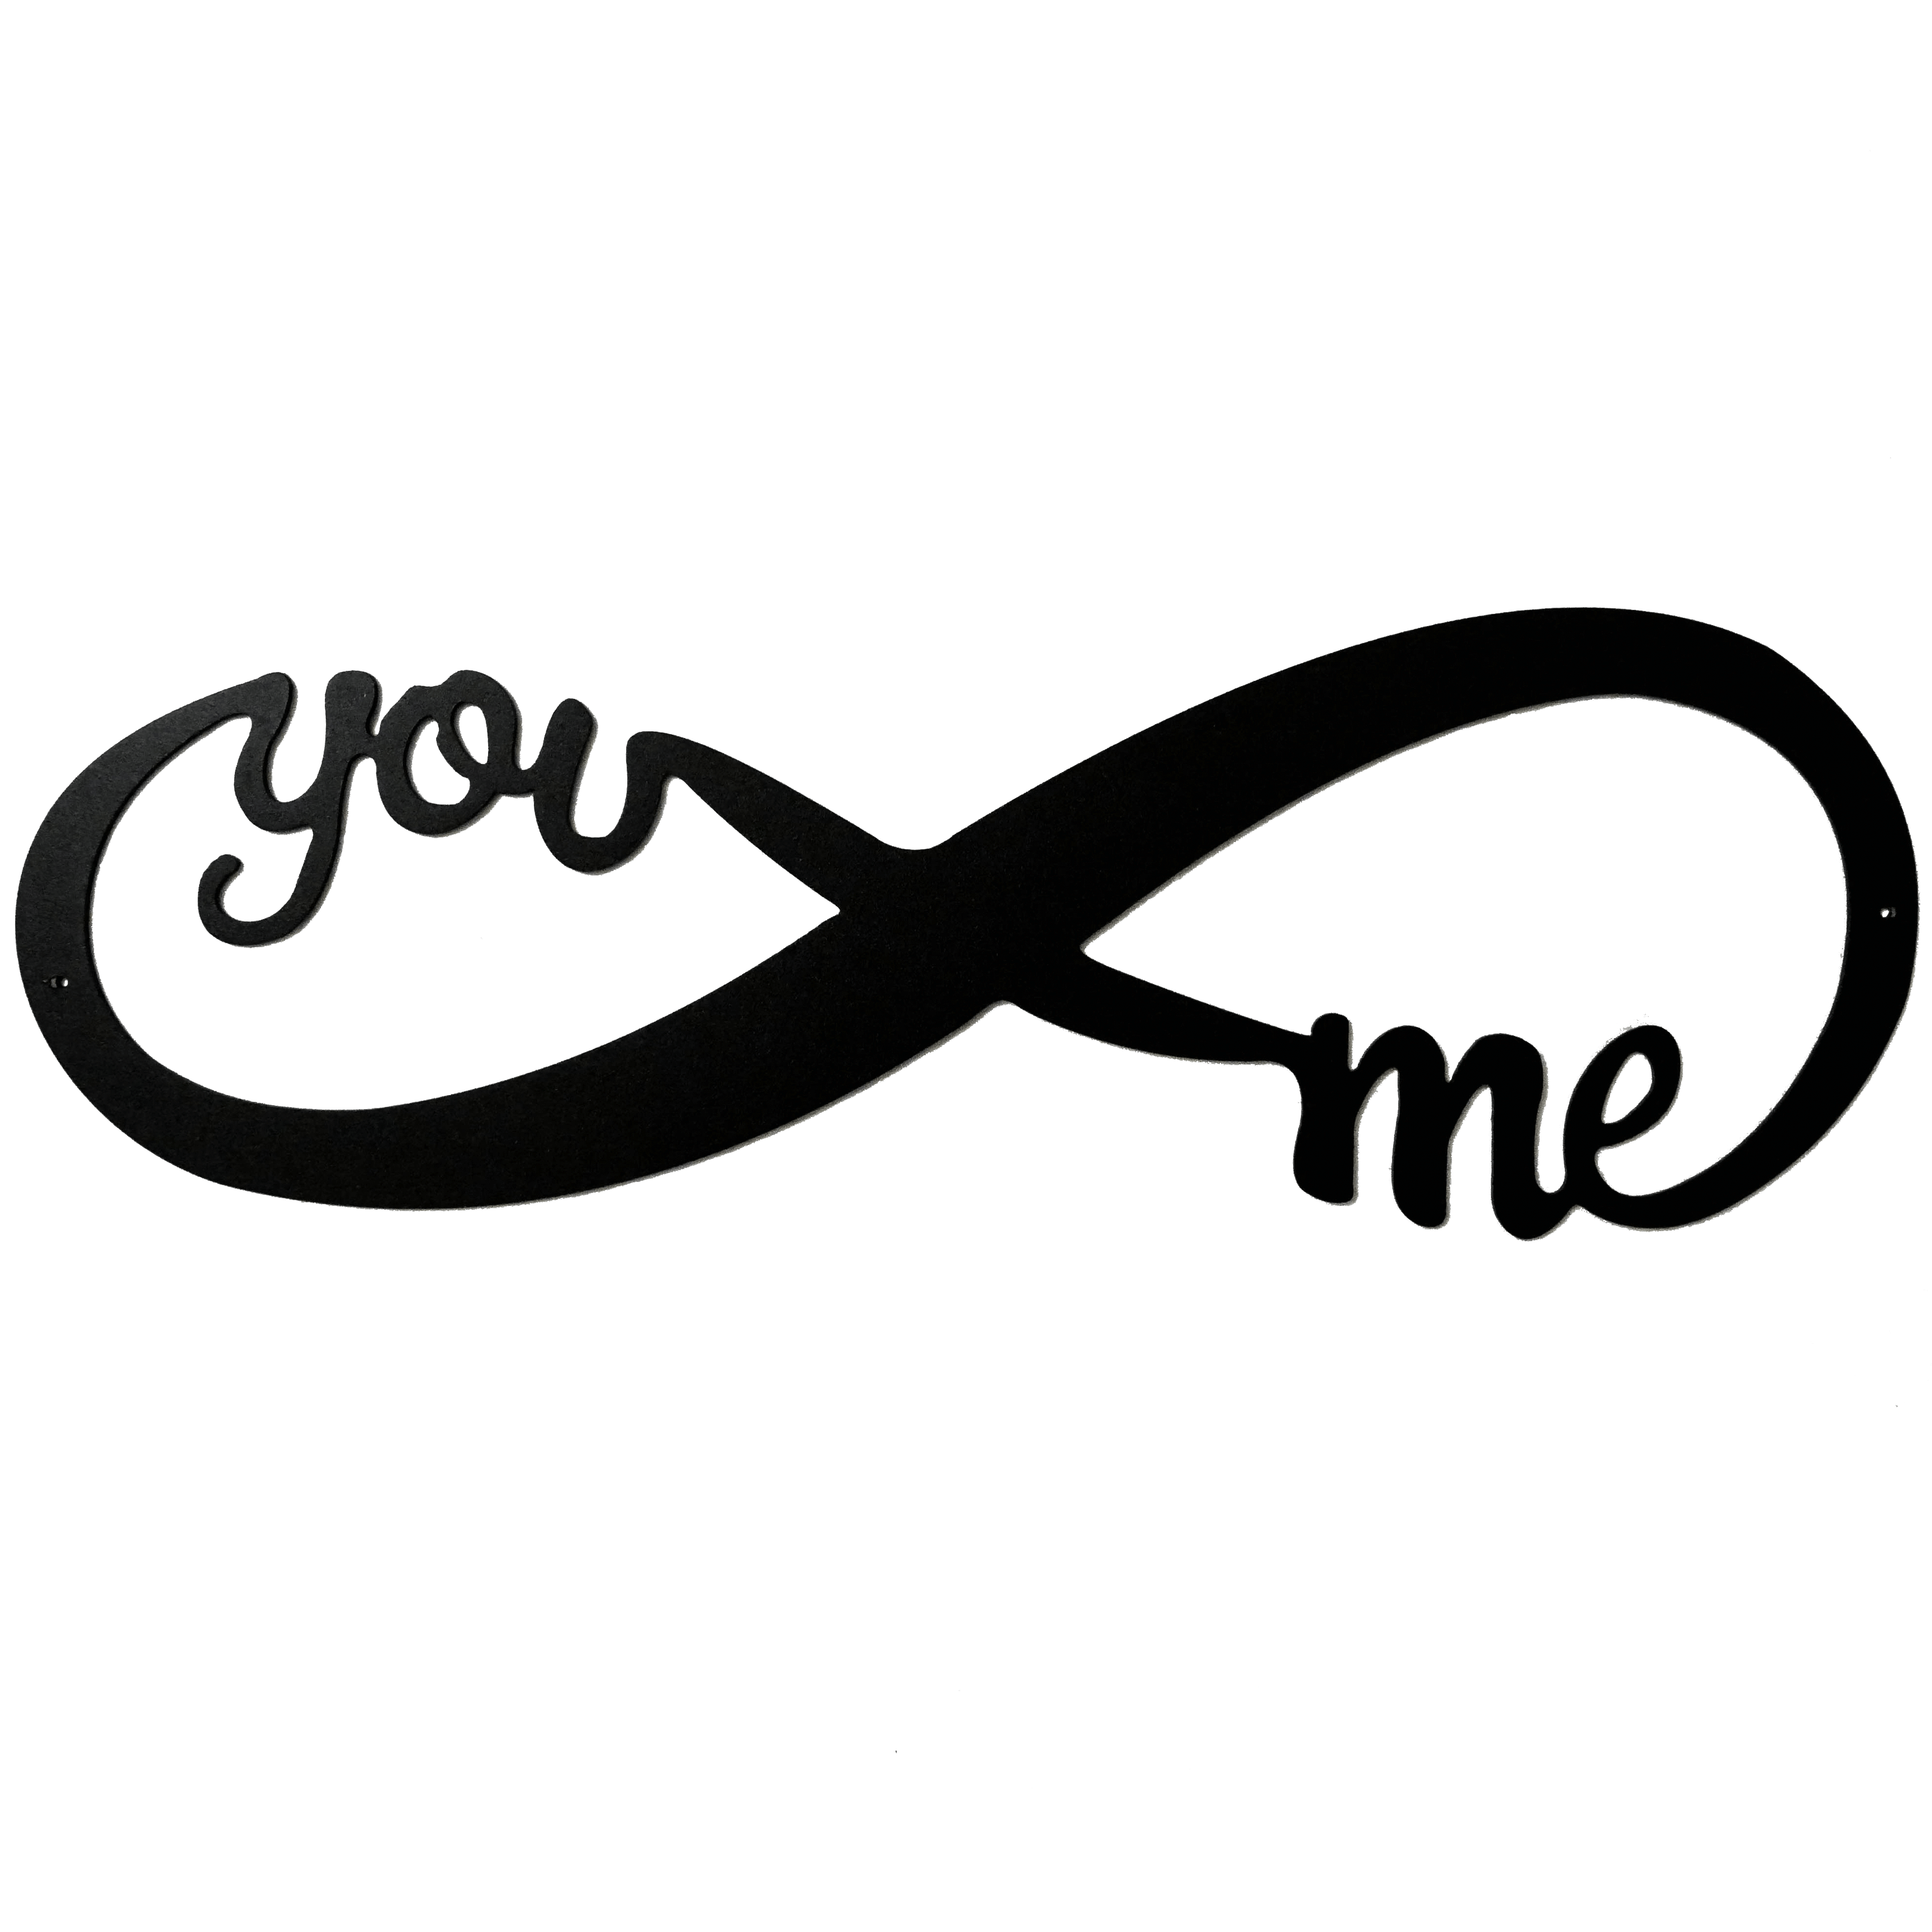 +PNG BRUSH INFINITE LOVE. by BitchesLovesUnicorns on ... |Infinite Love Png